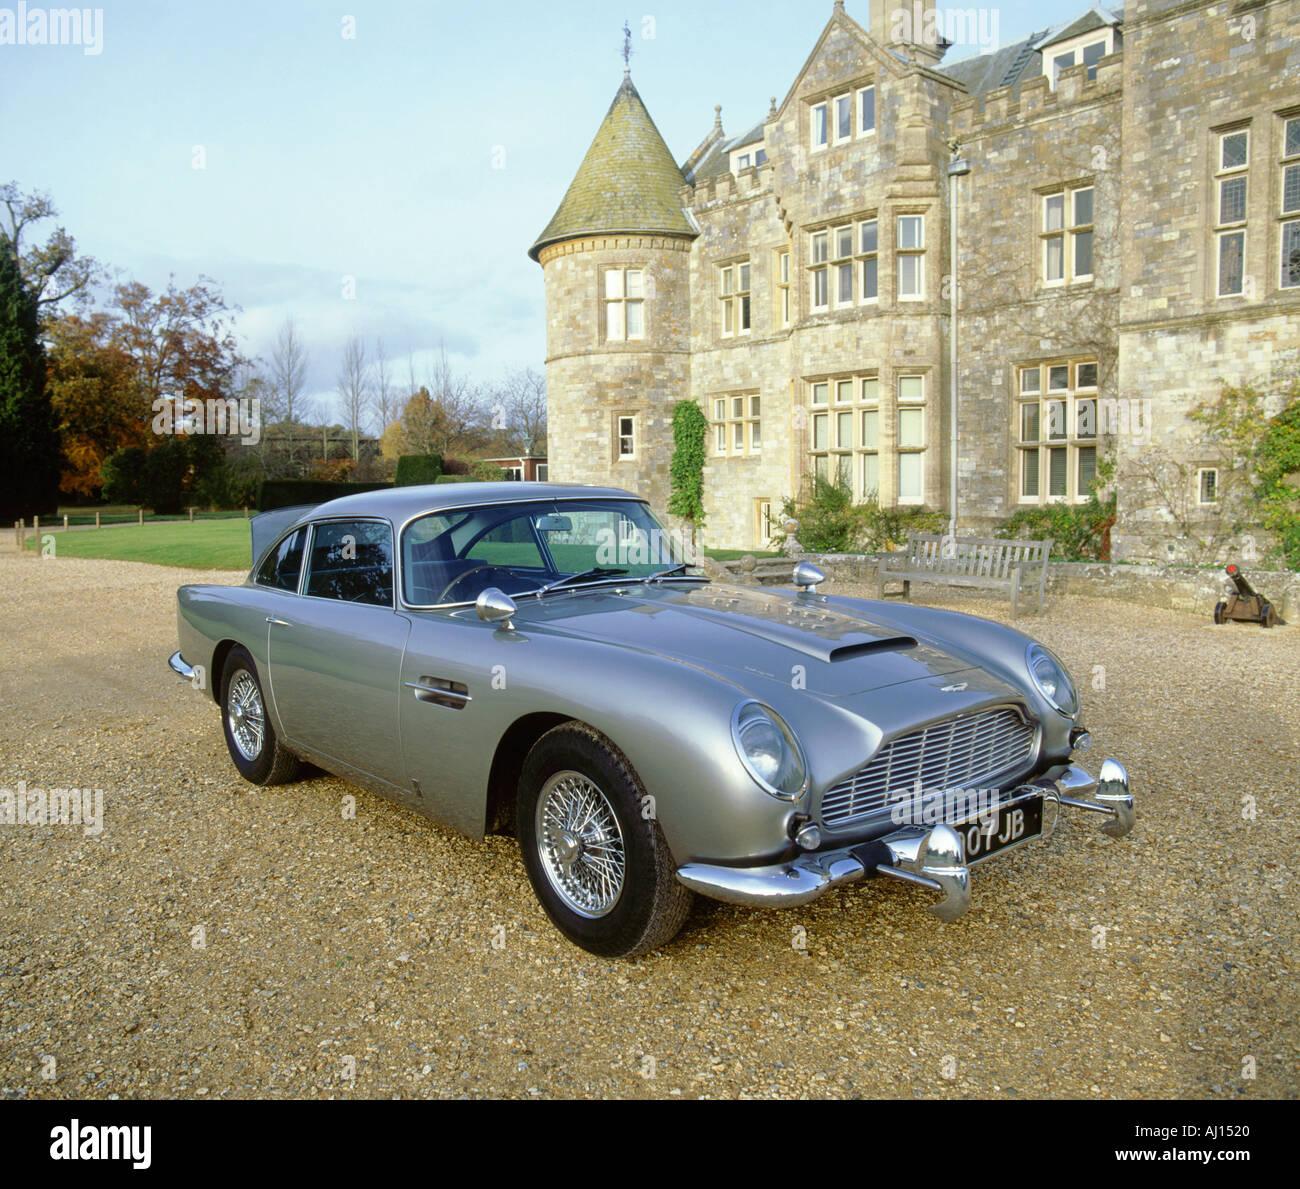 1965 Aston Martin DB5 James Bond Immagini Stock